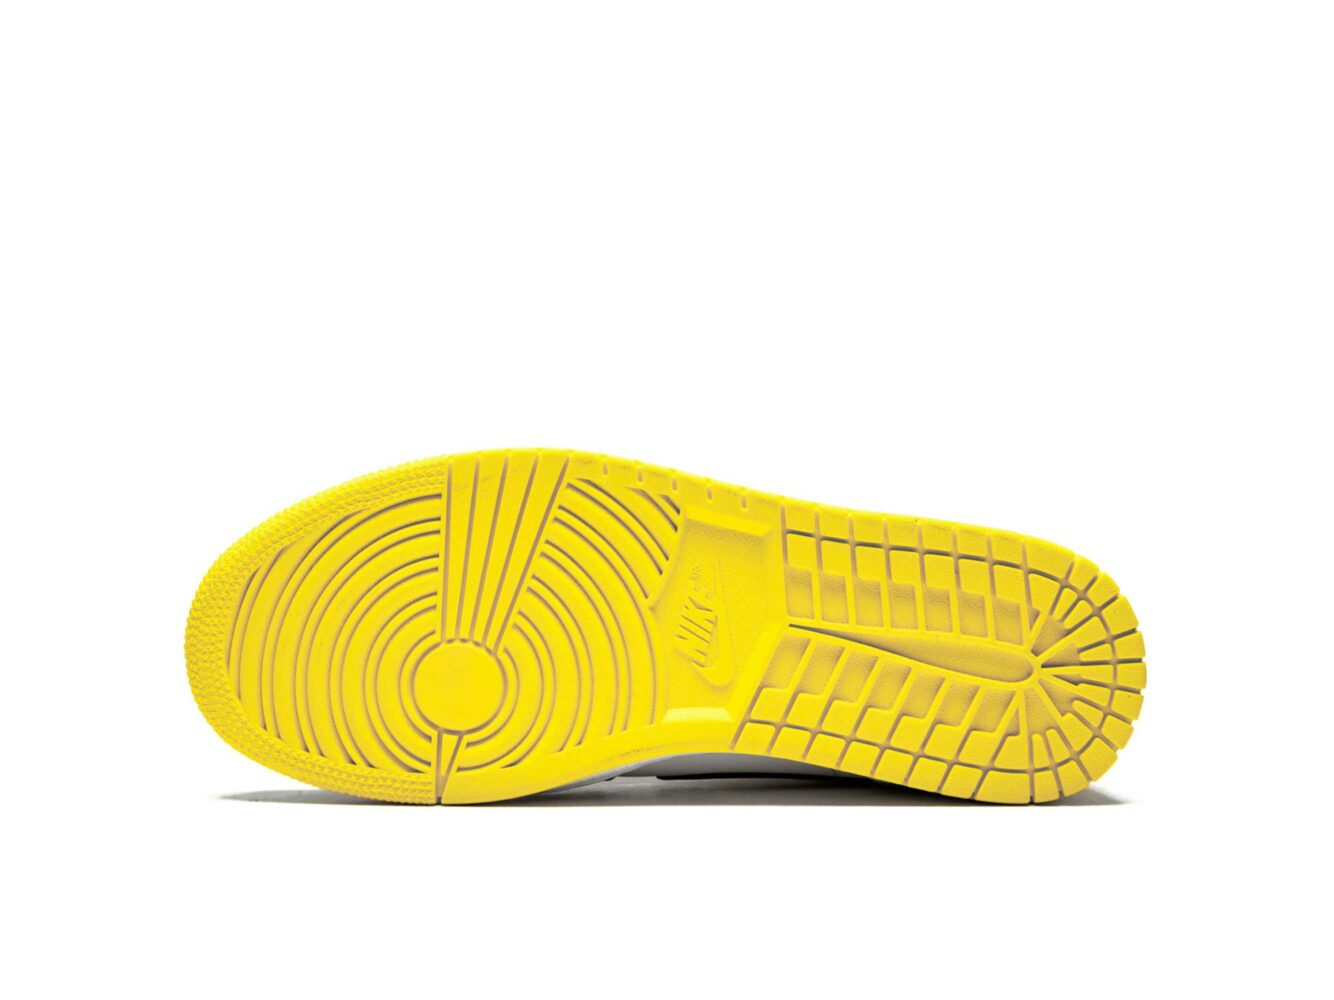 nike air Jordan 1 mid se yellow toe 852542_071 купить